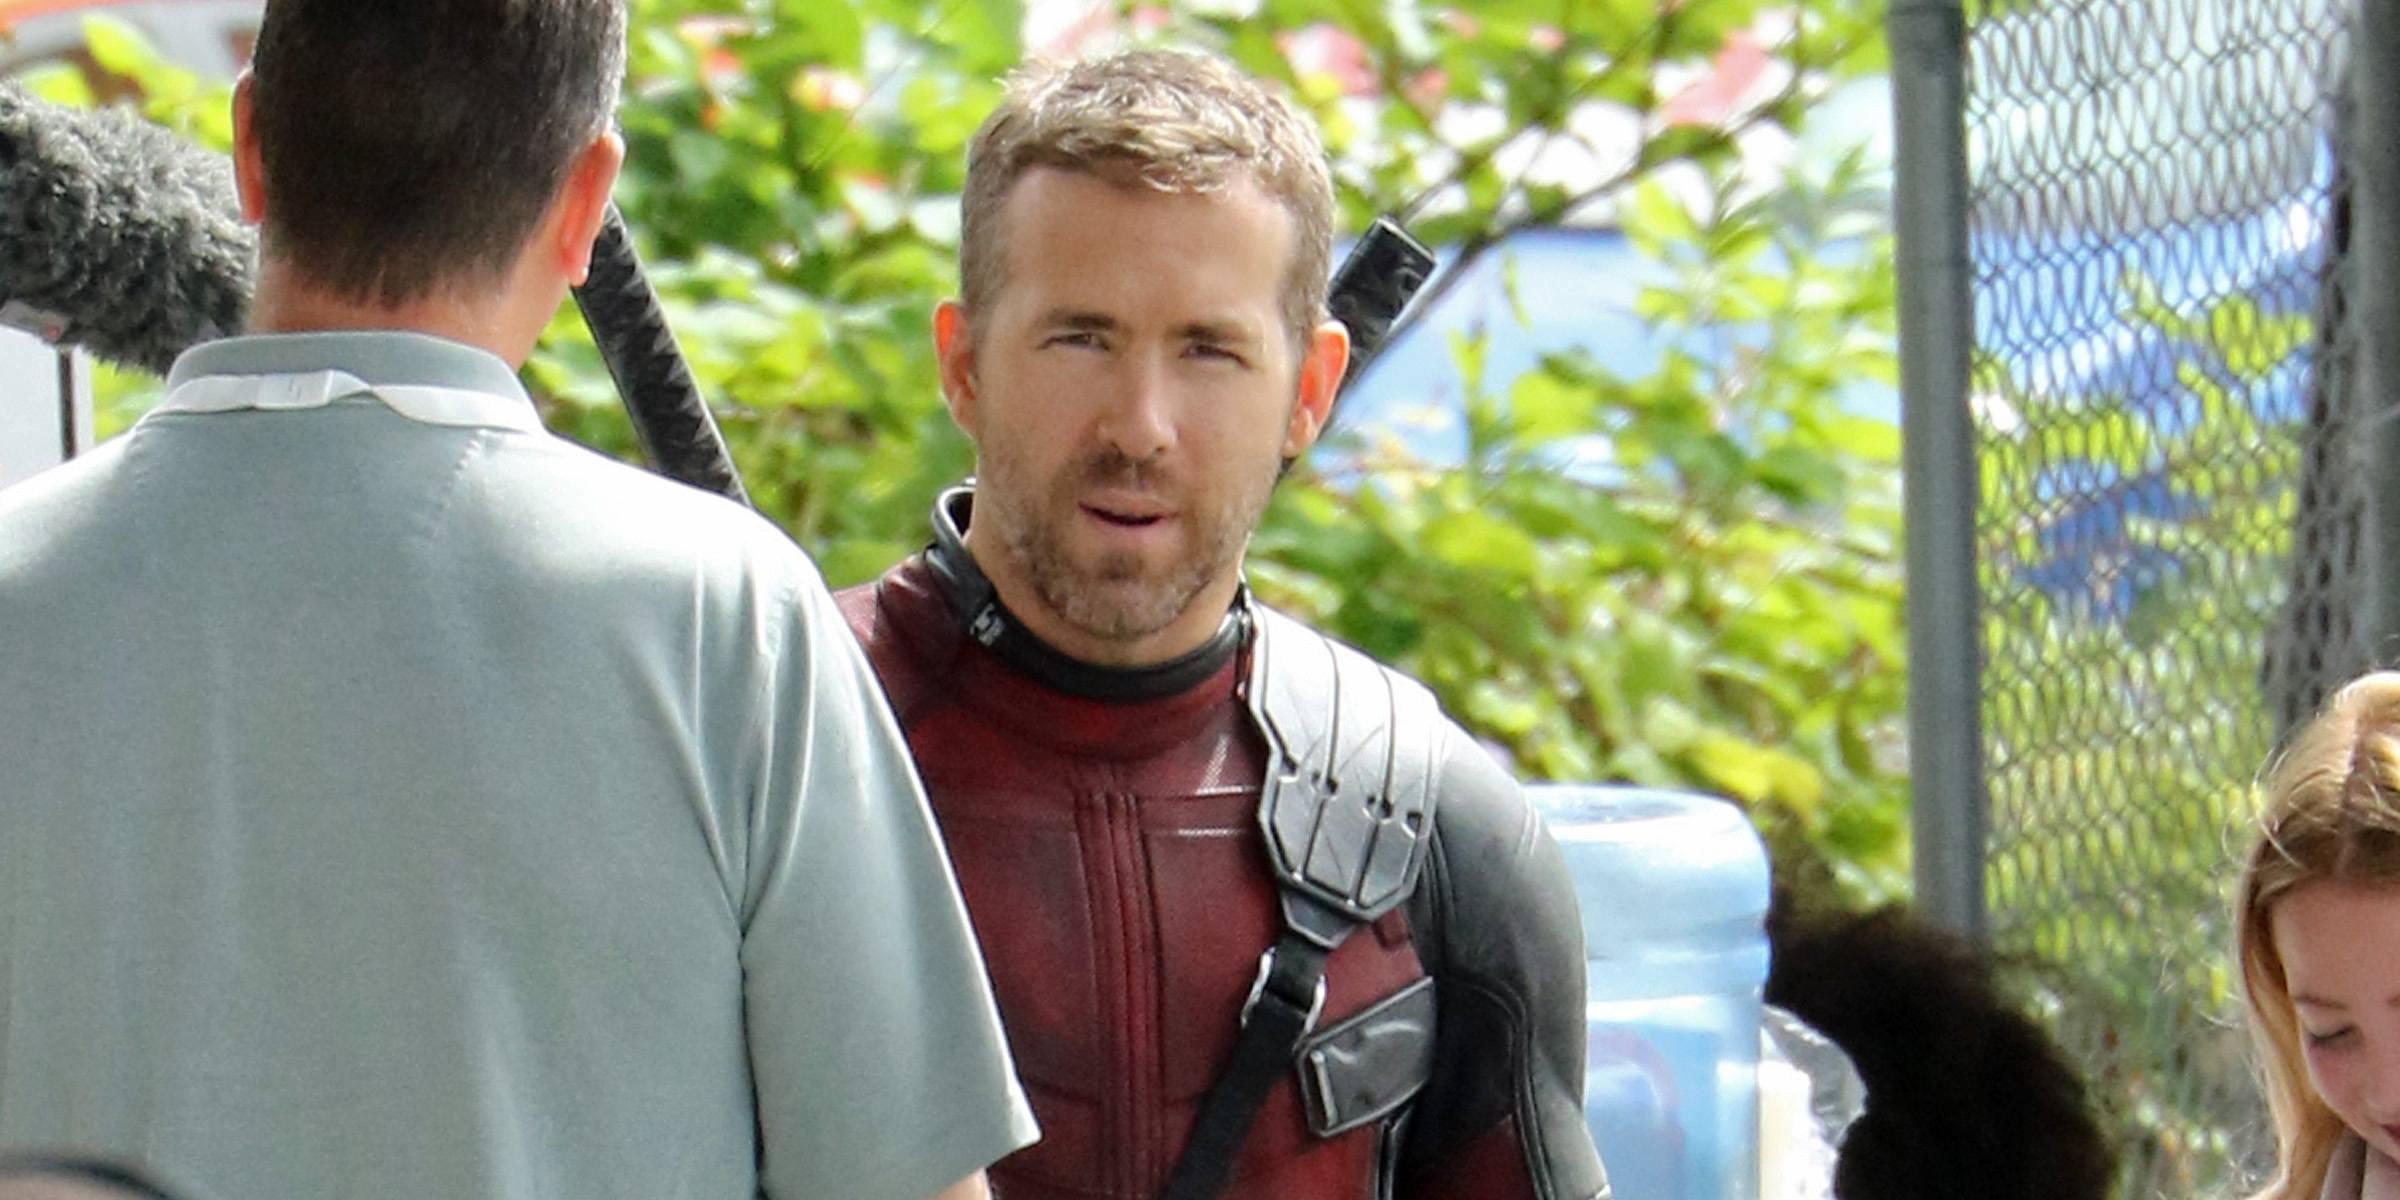 Ryan Reynolds meets fans on set of 'Deadpool 2' (PHOTOS)